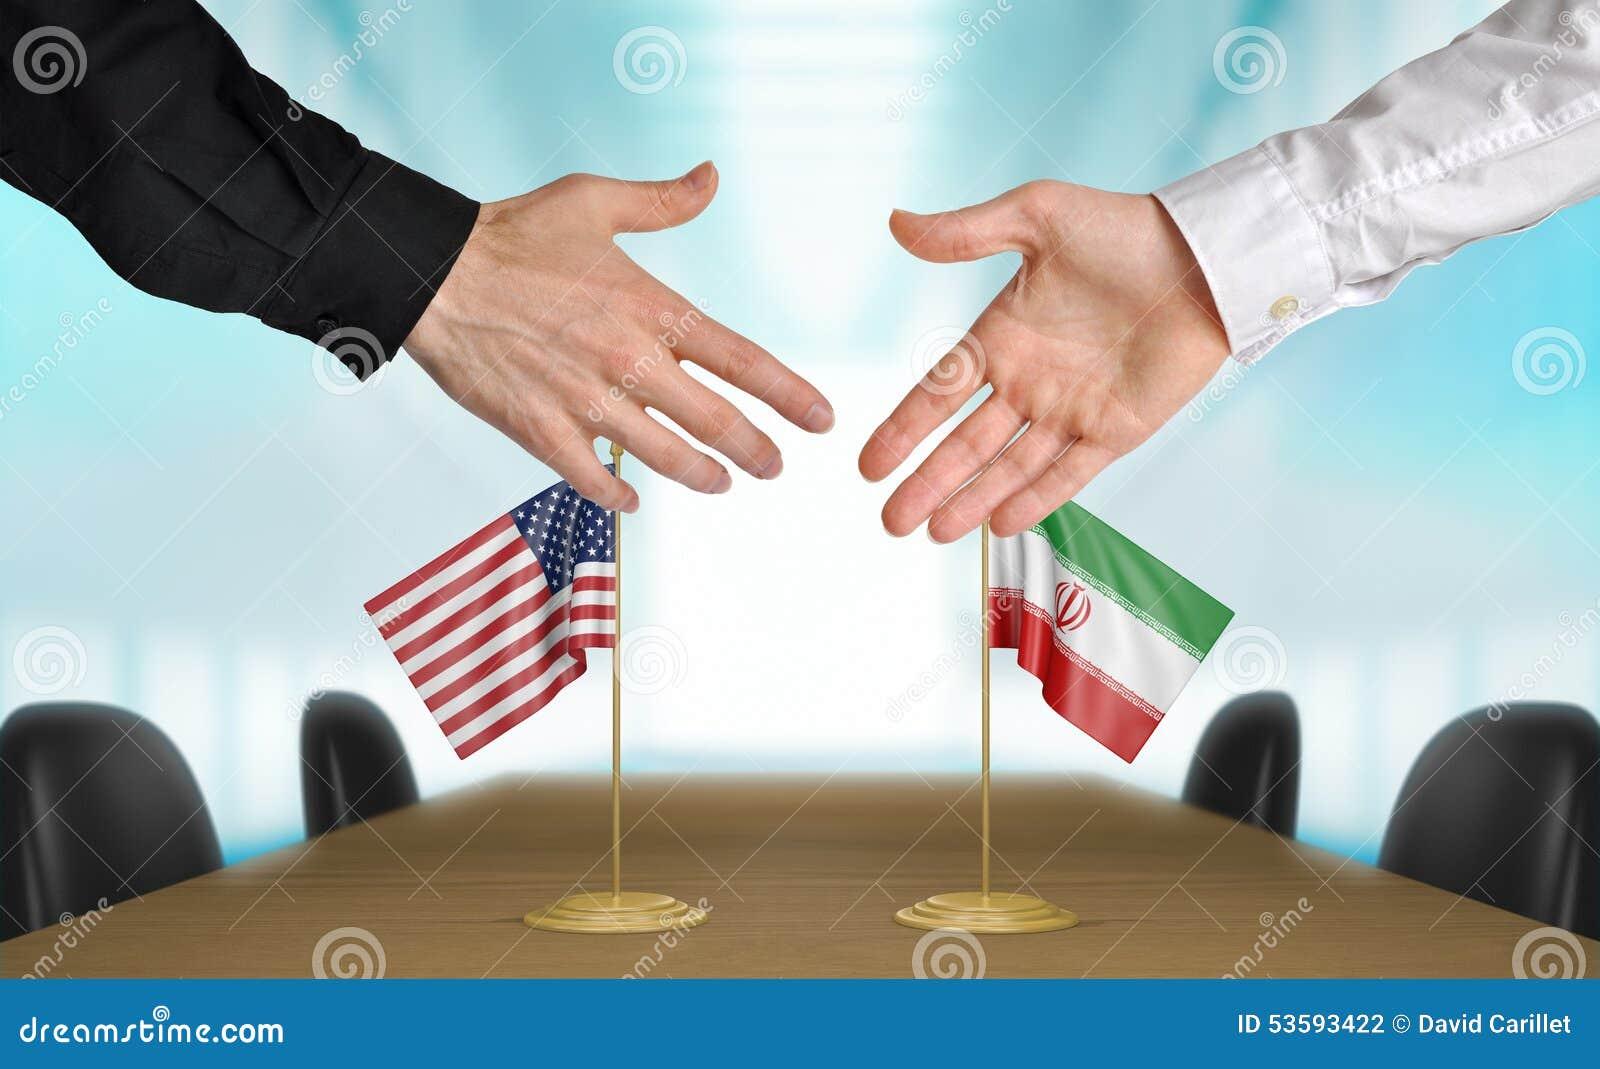 Stany Zjednoczone i Iran dyplomaci ono zgadza się na transakci